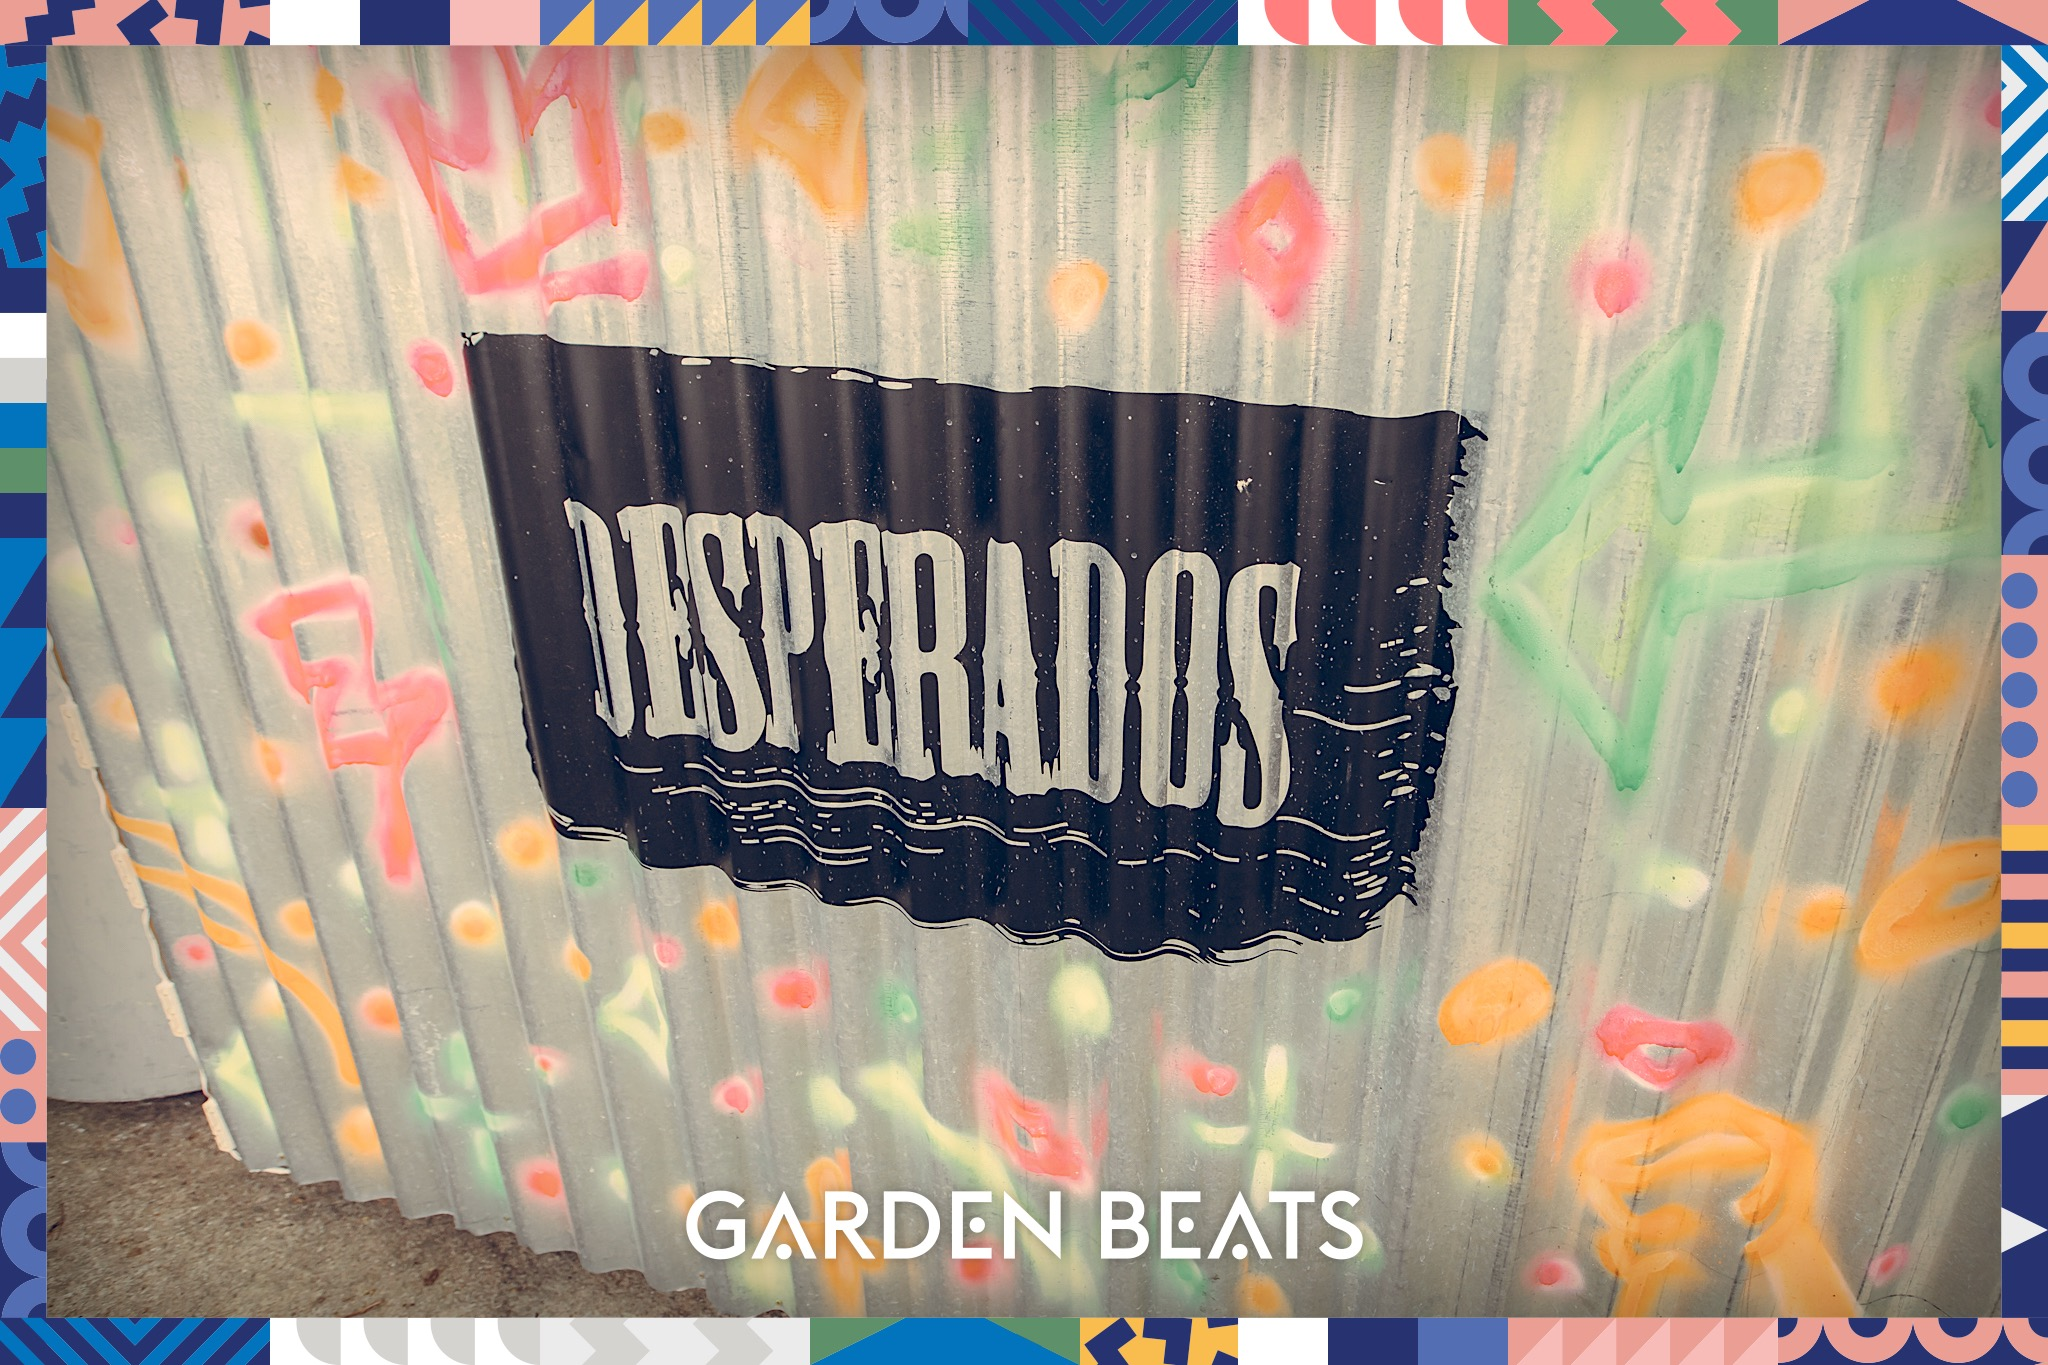 03032018_GardenBeats_Colossal180_Watermarked.jpg